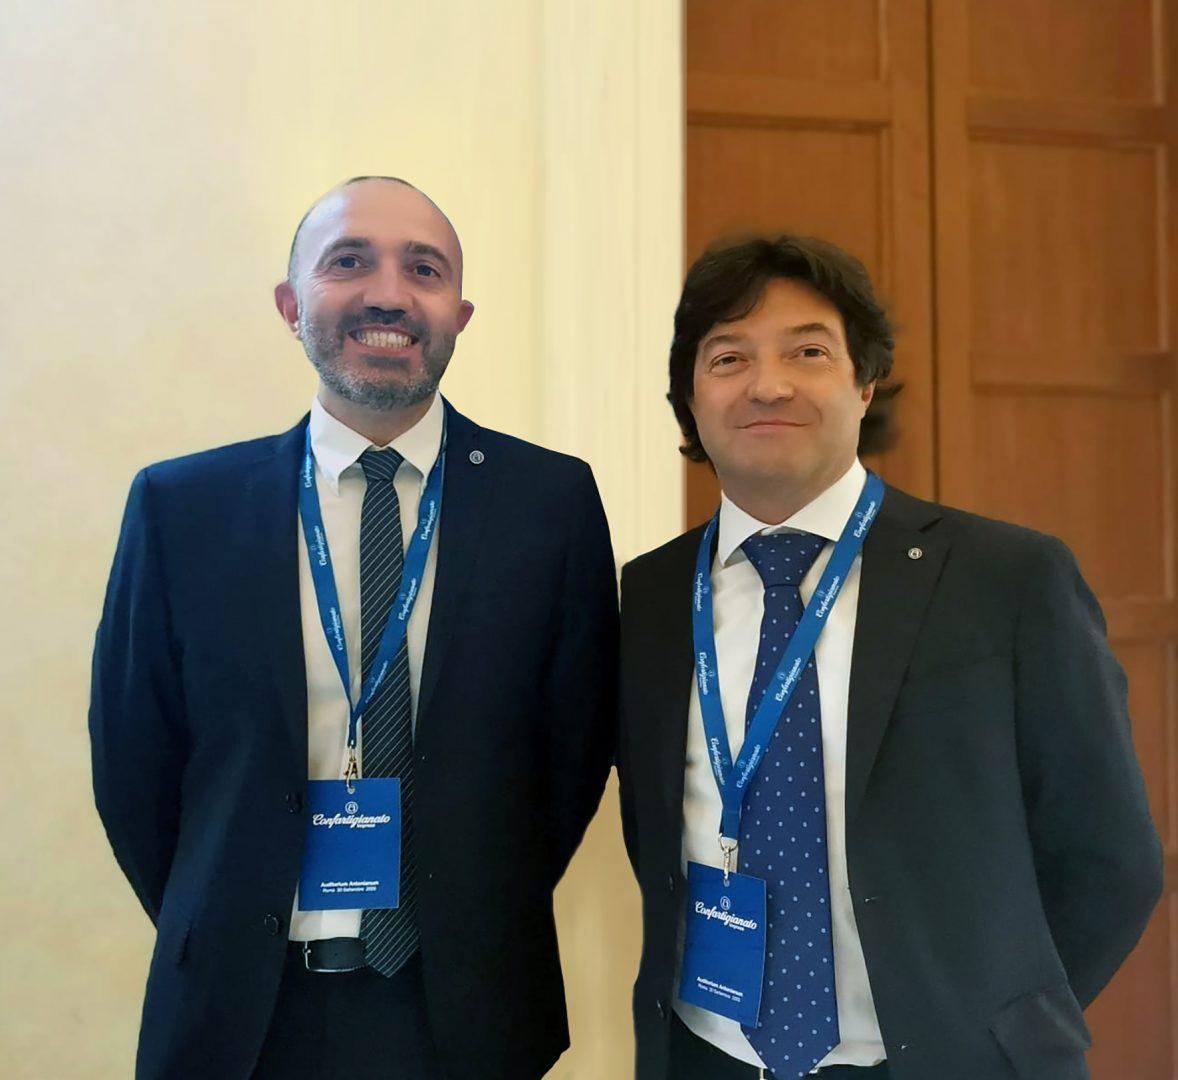 Roberto Iraci Sareri e Roberto Boschetto confartigianato